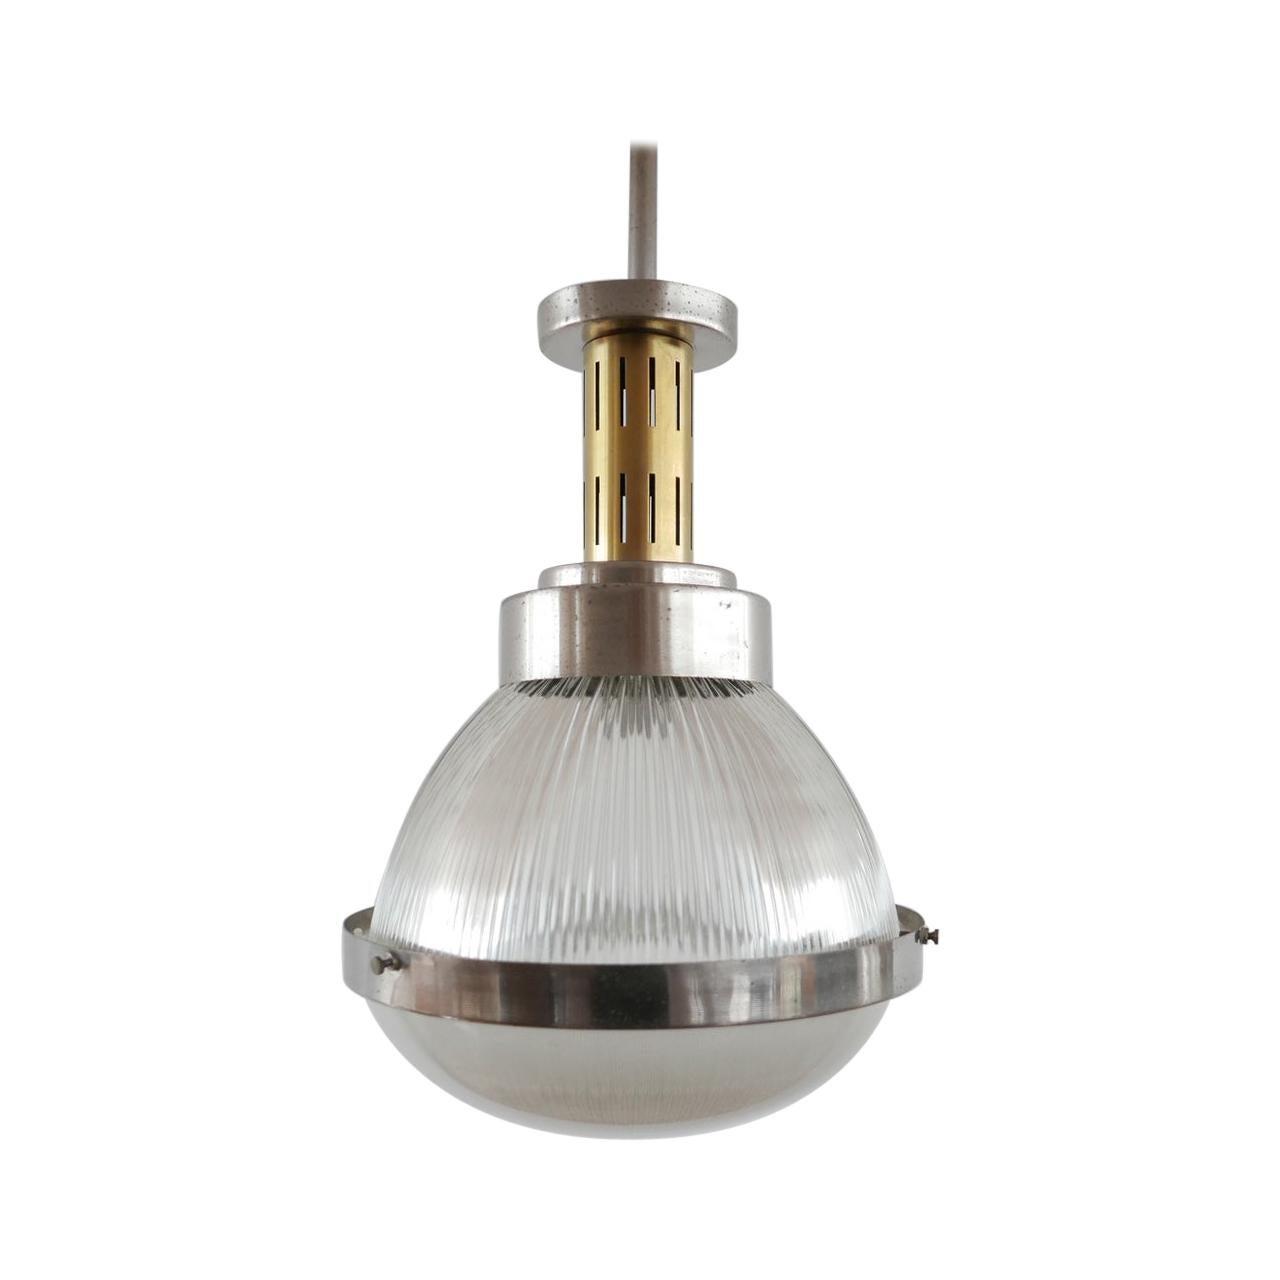 Italian Pendant Light Attributed to Ignazio Gardella